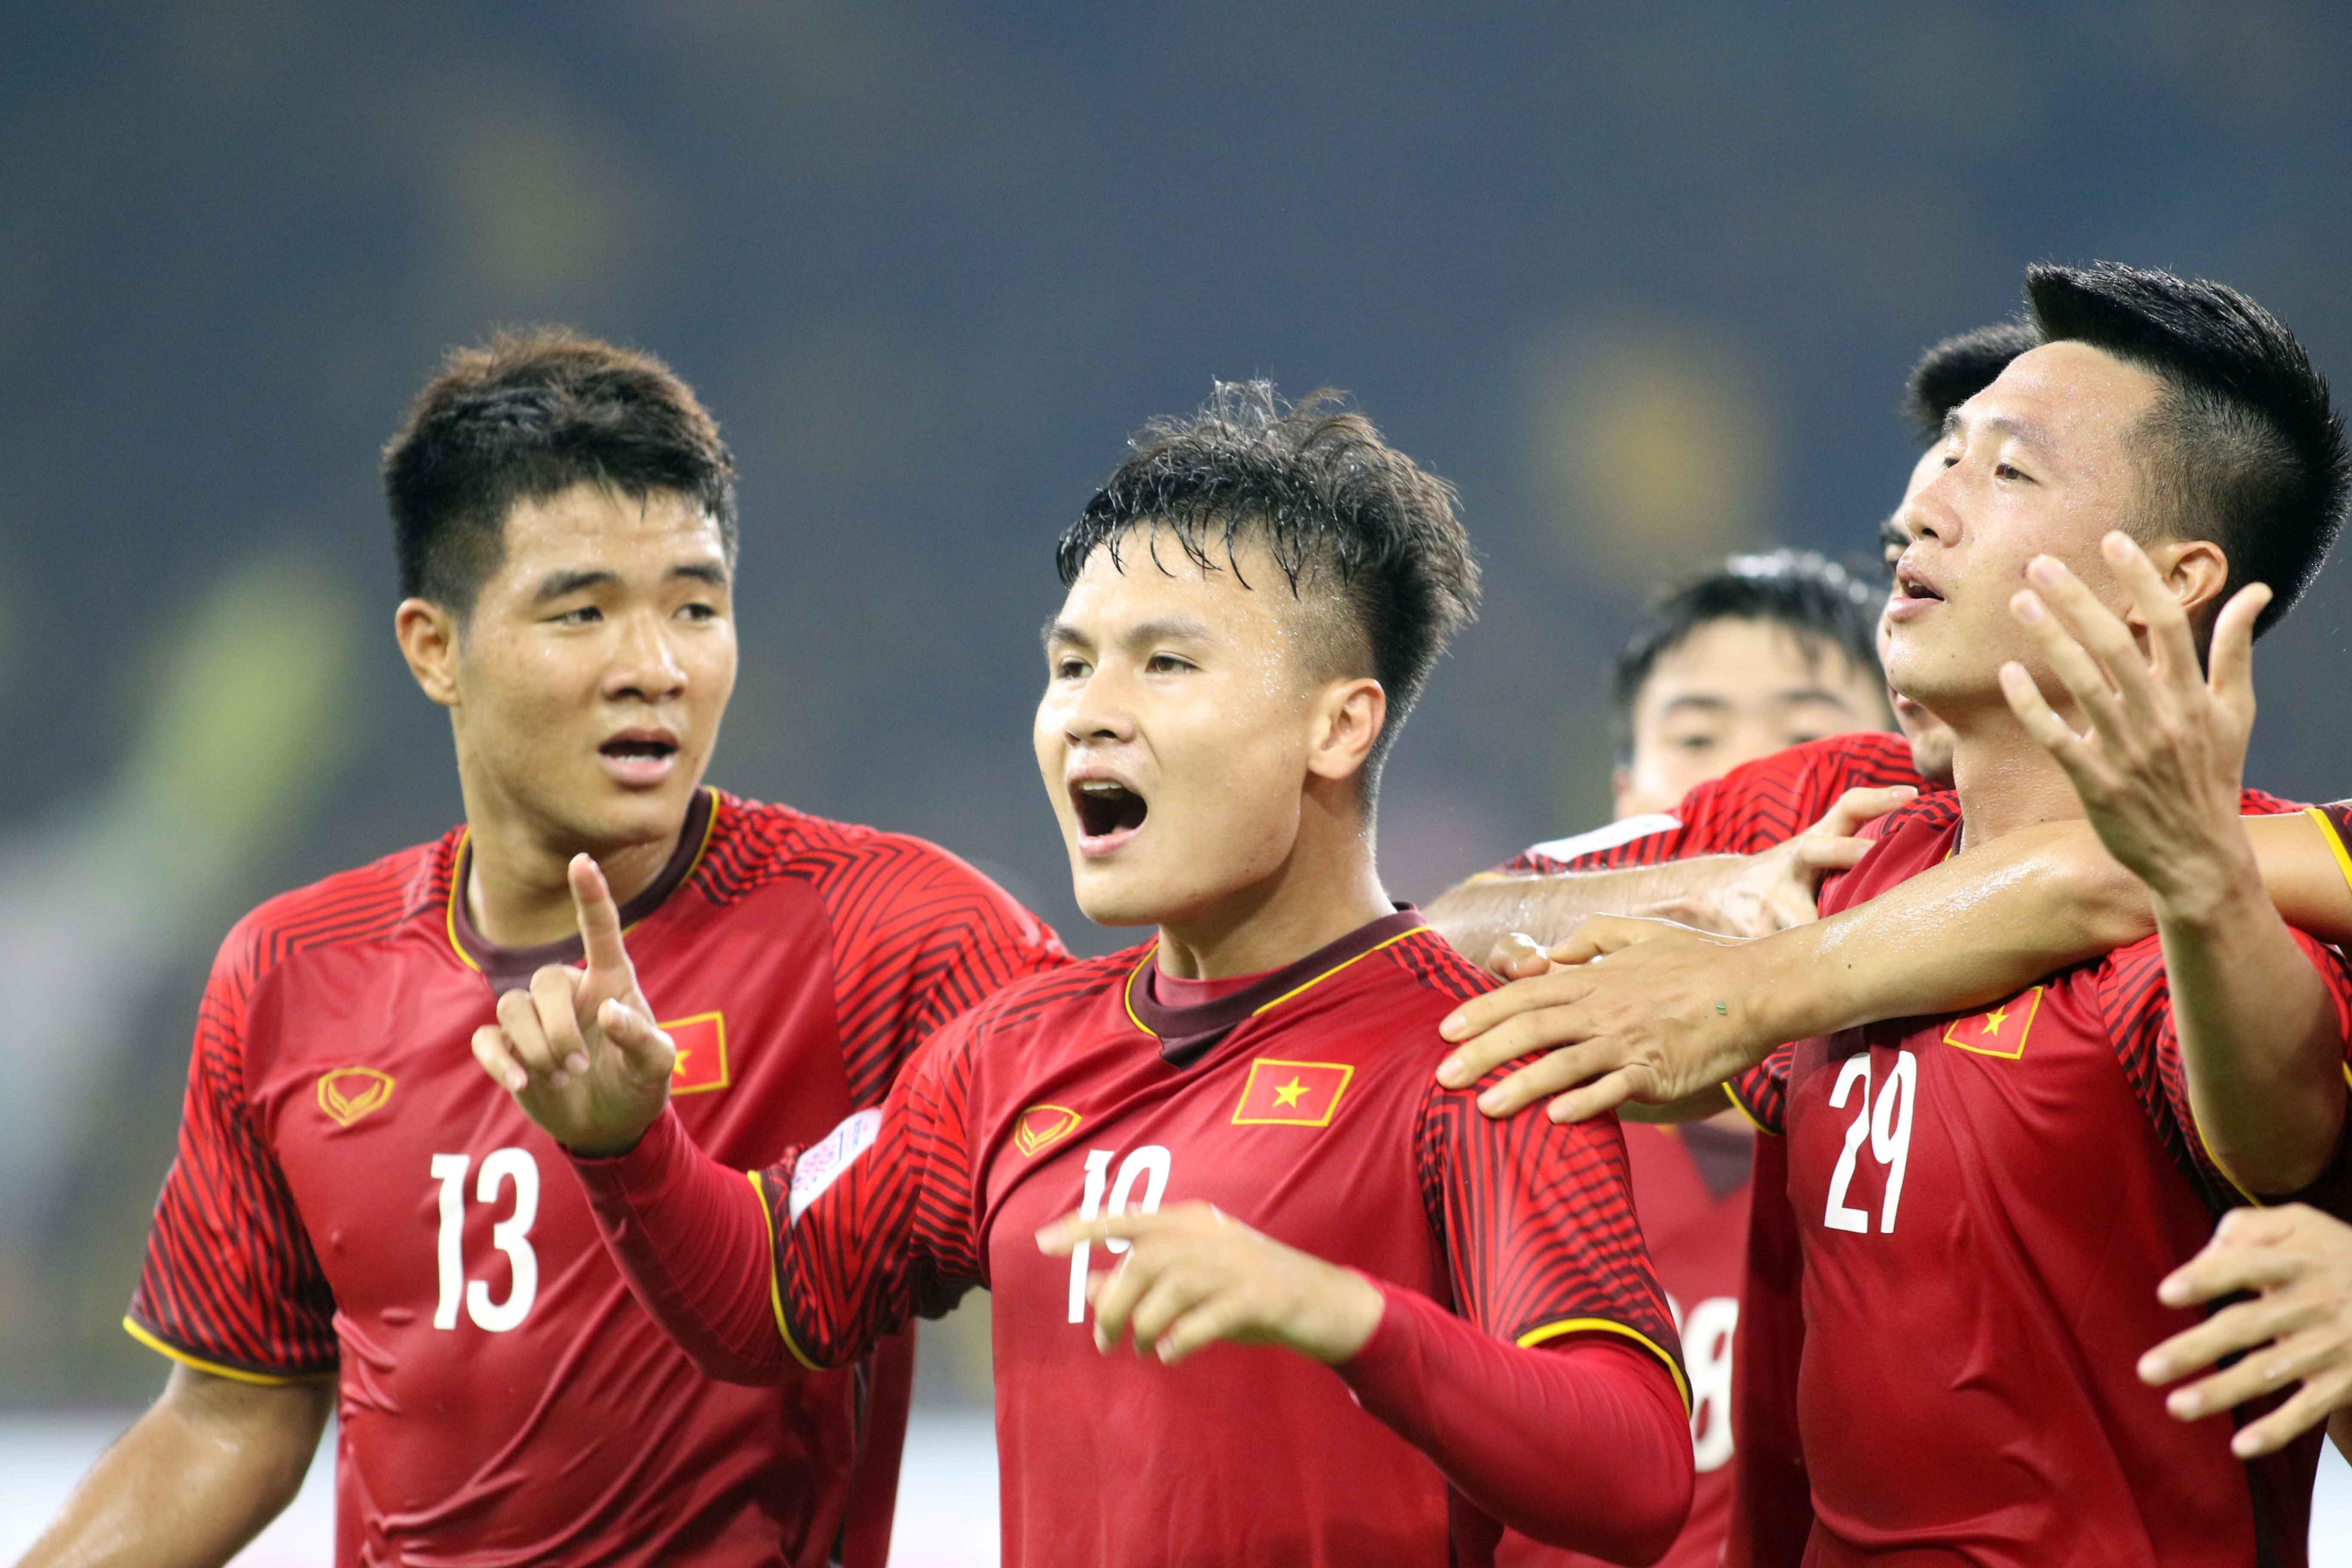 Duc Chinh Quang Hai Huy Hung Vietnam Malaysia AFF Cup 2018